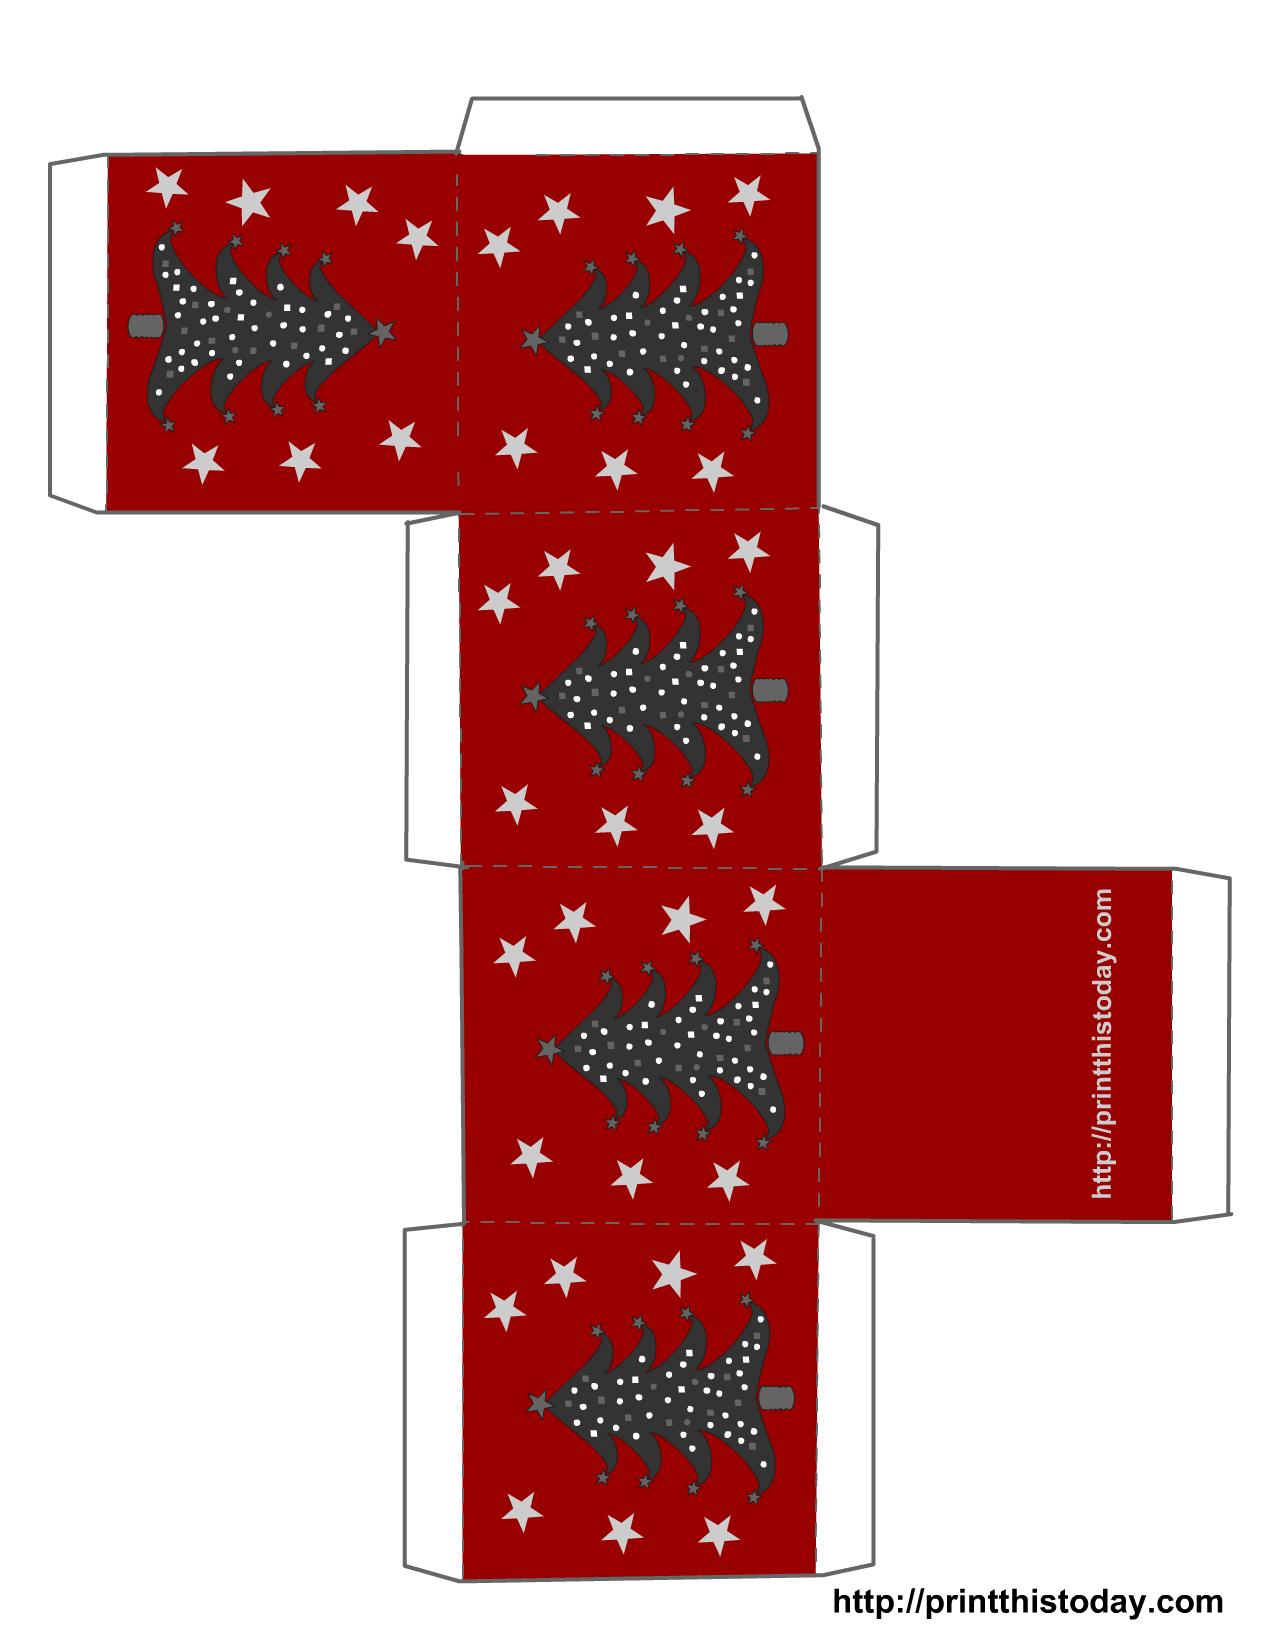 Hey Jillian Crider Thx For Posting This I Make Homemade Truffles Every Year For Christmas Free Christmas Printables Christmas Printables Christmas Box